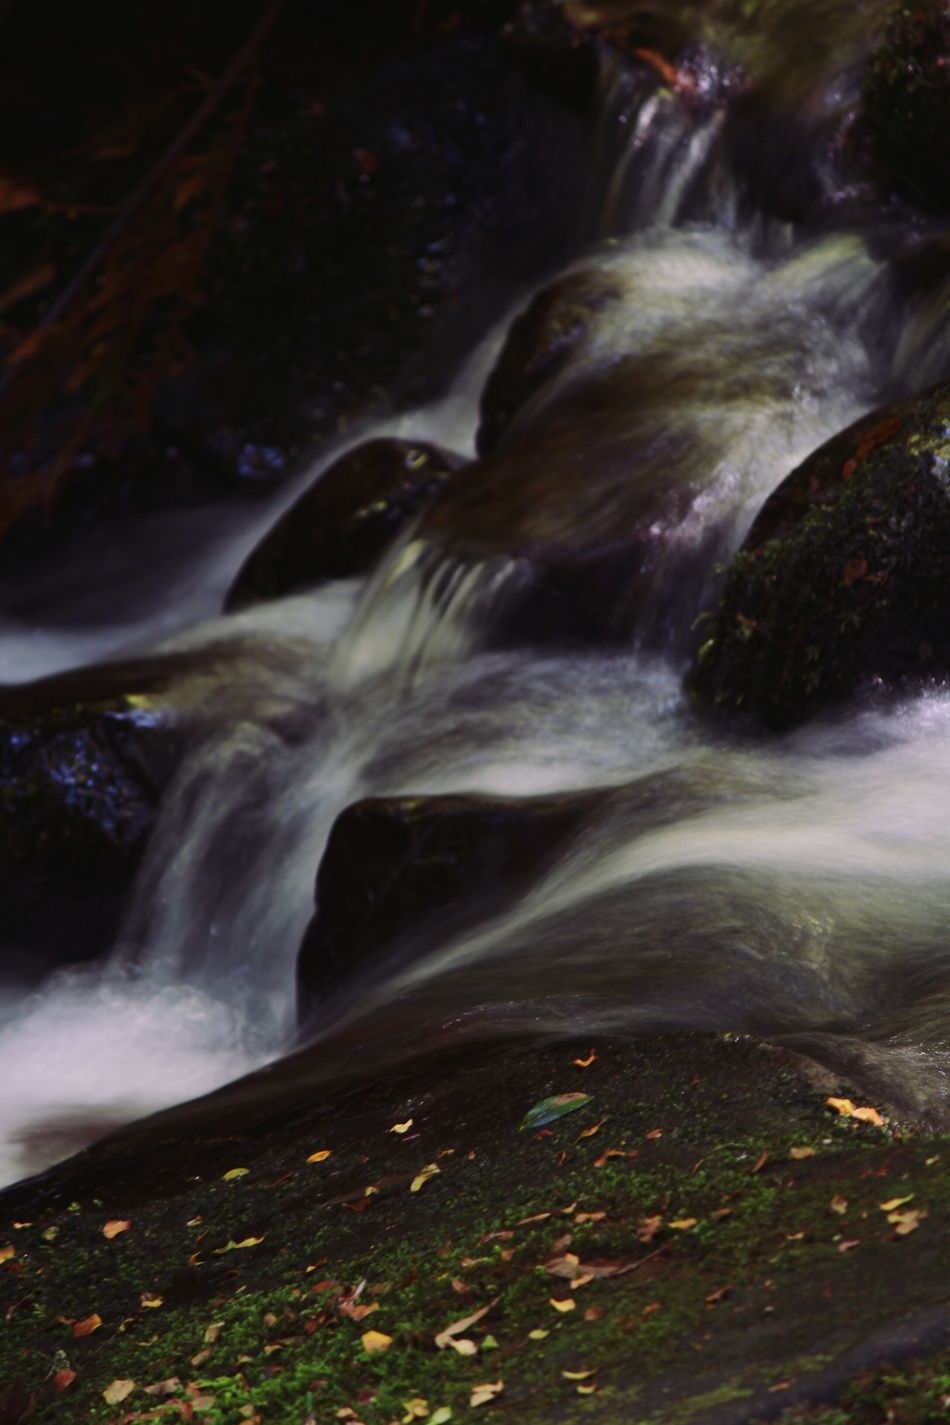 Yarra Valley Adventure Warburton Yarra River Rock - Object Running Water River Beauty In Nature Scenics Waterfall Motion Stream - Flowing Water Flowing Flowing Water